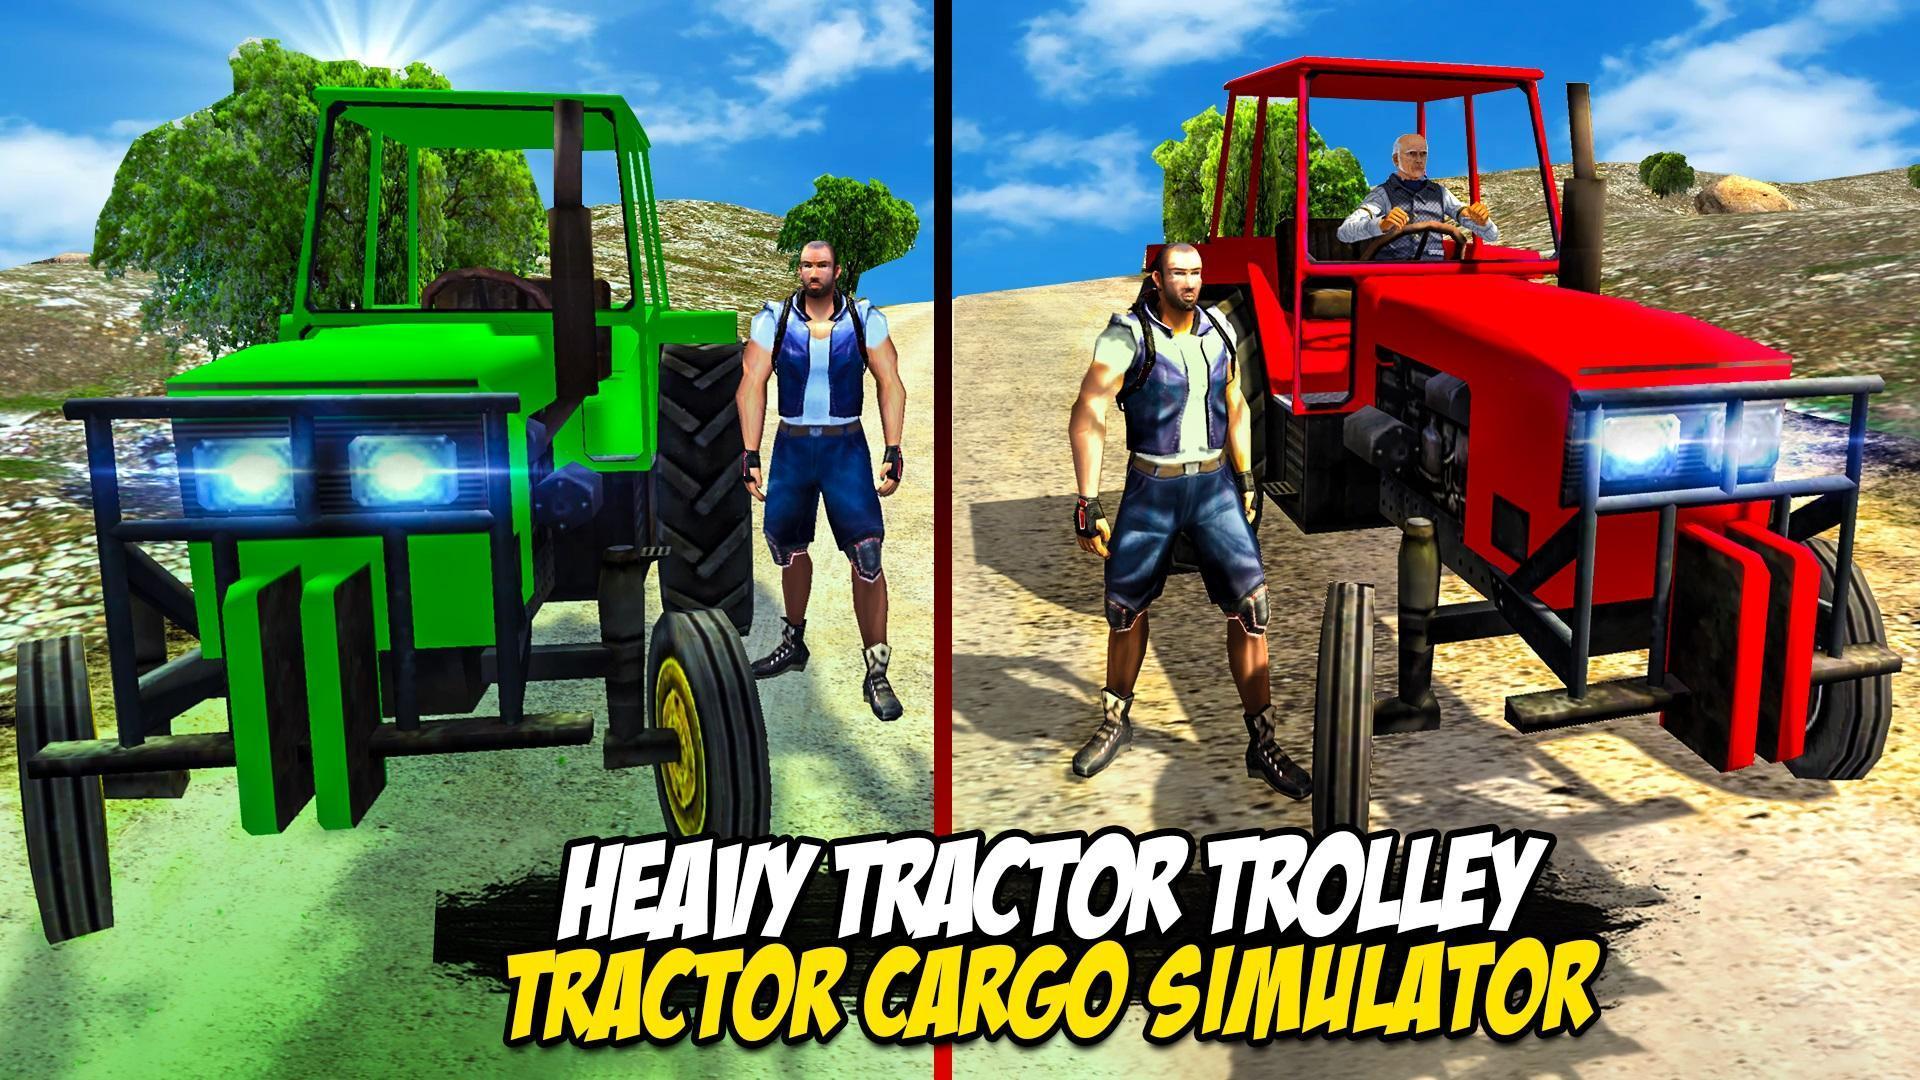 Heavy Tractor Trolley: Tractor Cargo Simulator🚜🚜 3.1 Screenshot 9